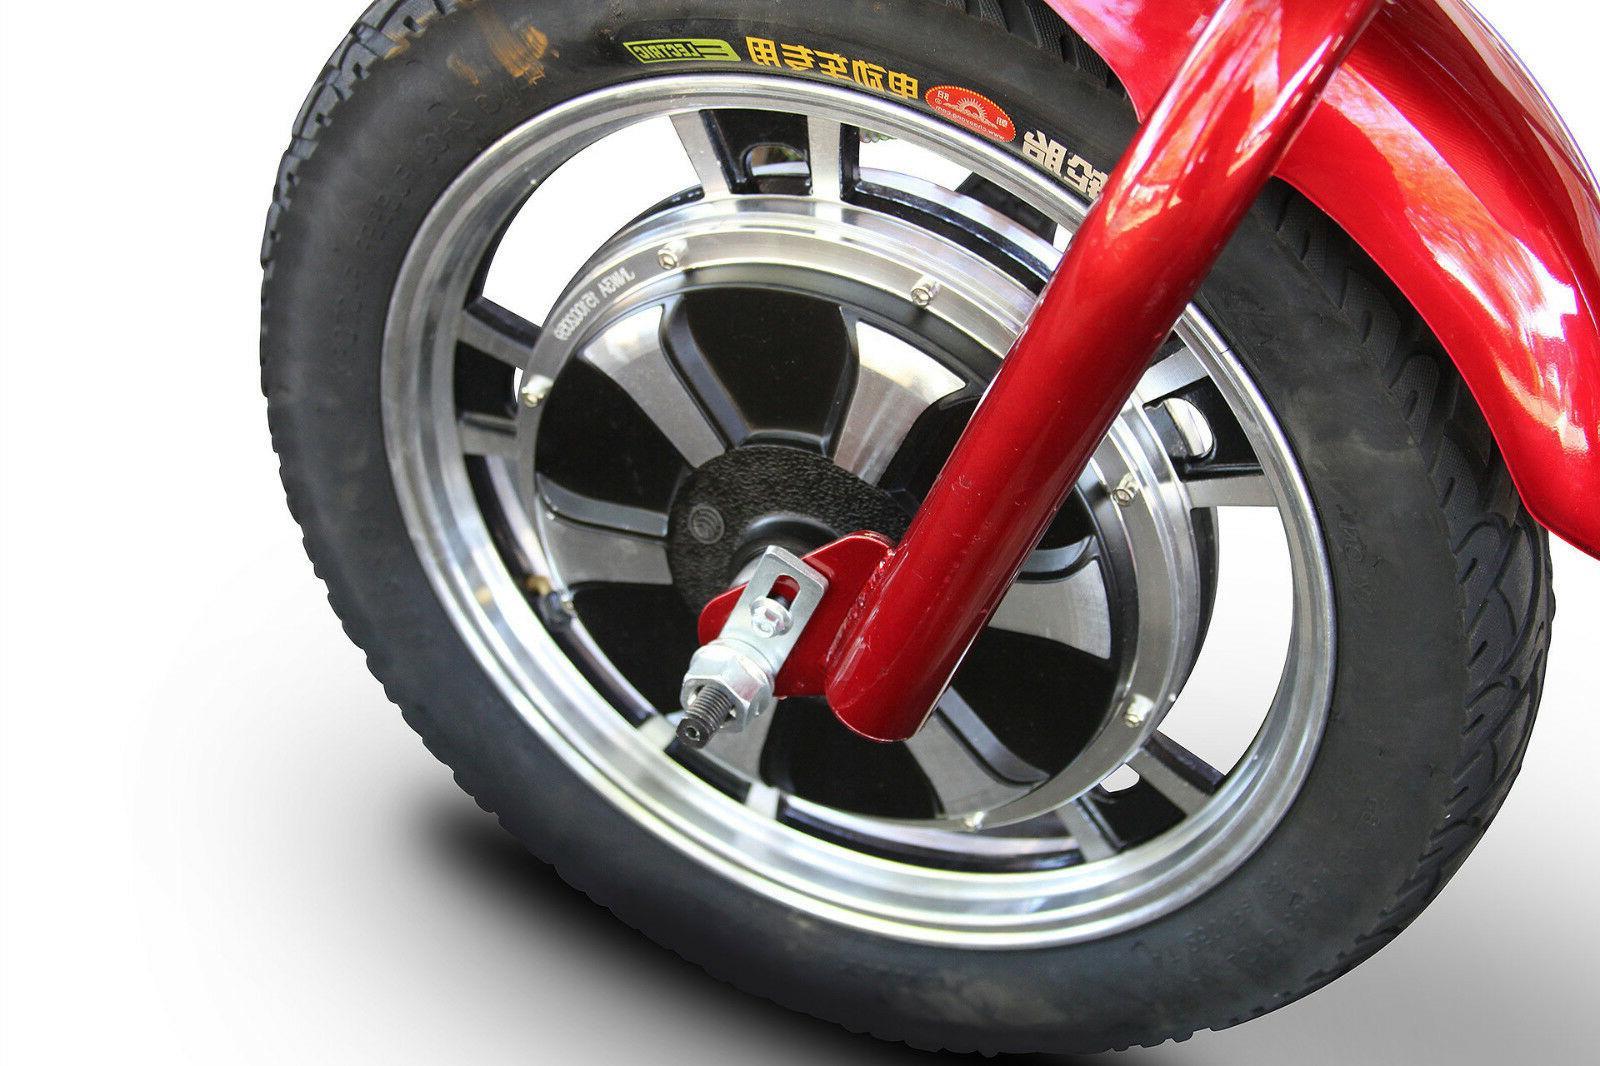 eWheels Stand-N-Ride Mobility - emission